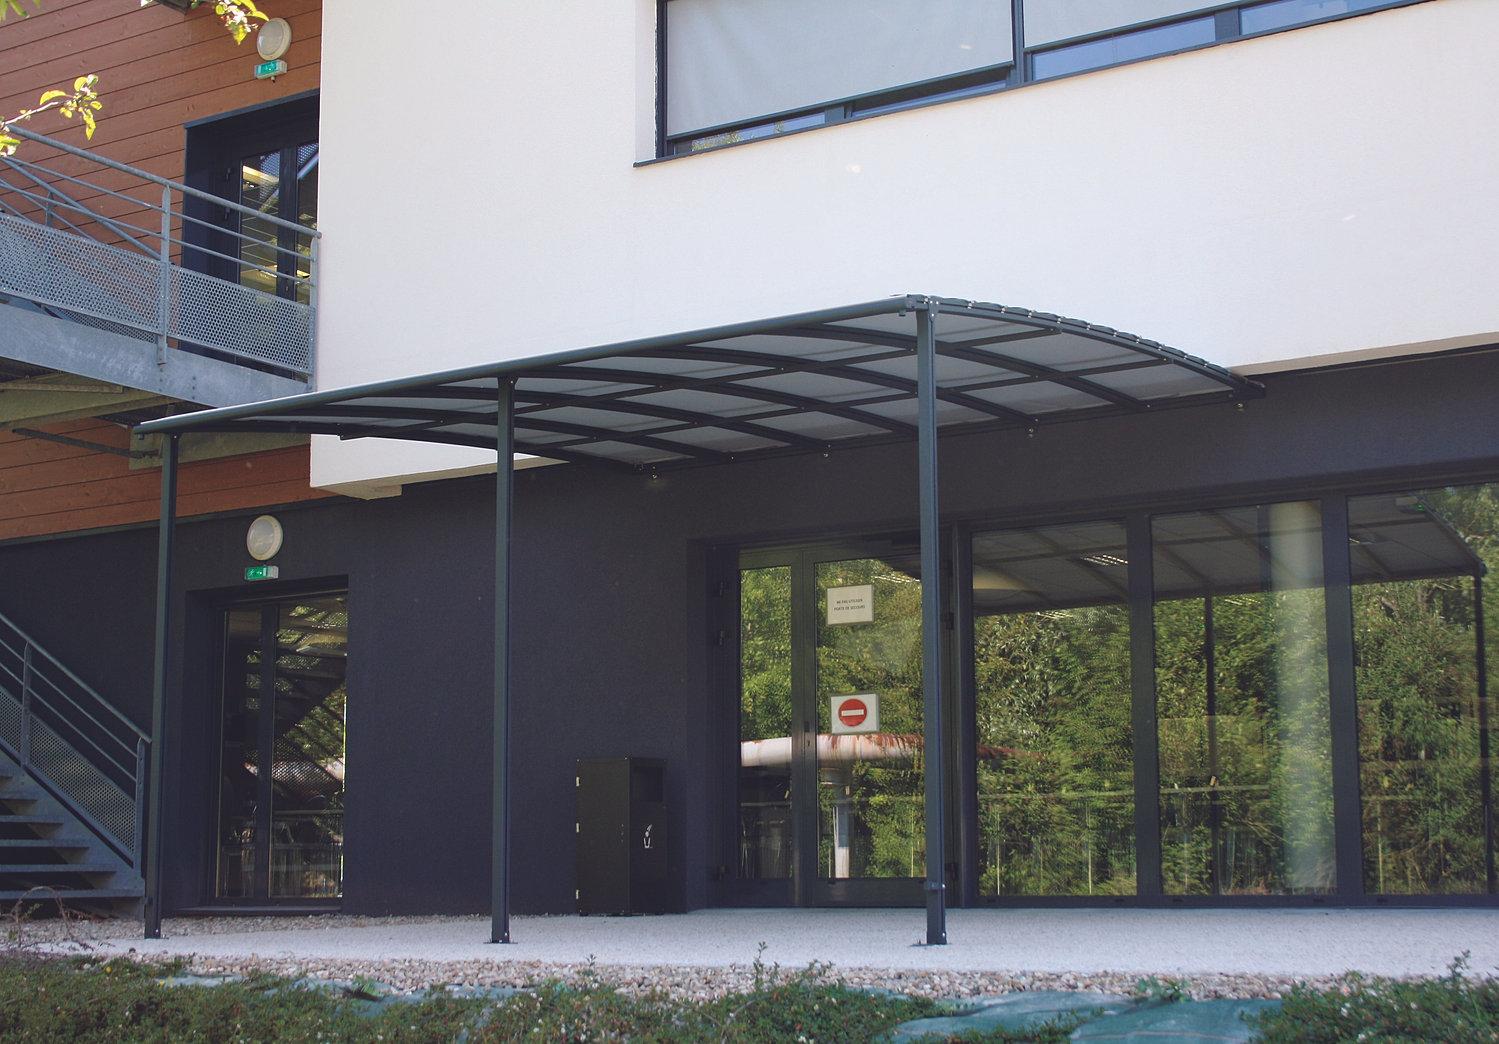 Pergola murale ou adoss e fix e au mur et au sol avec pieds for Comabri terrasse alu polycarbonate